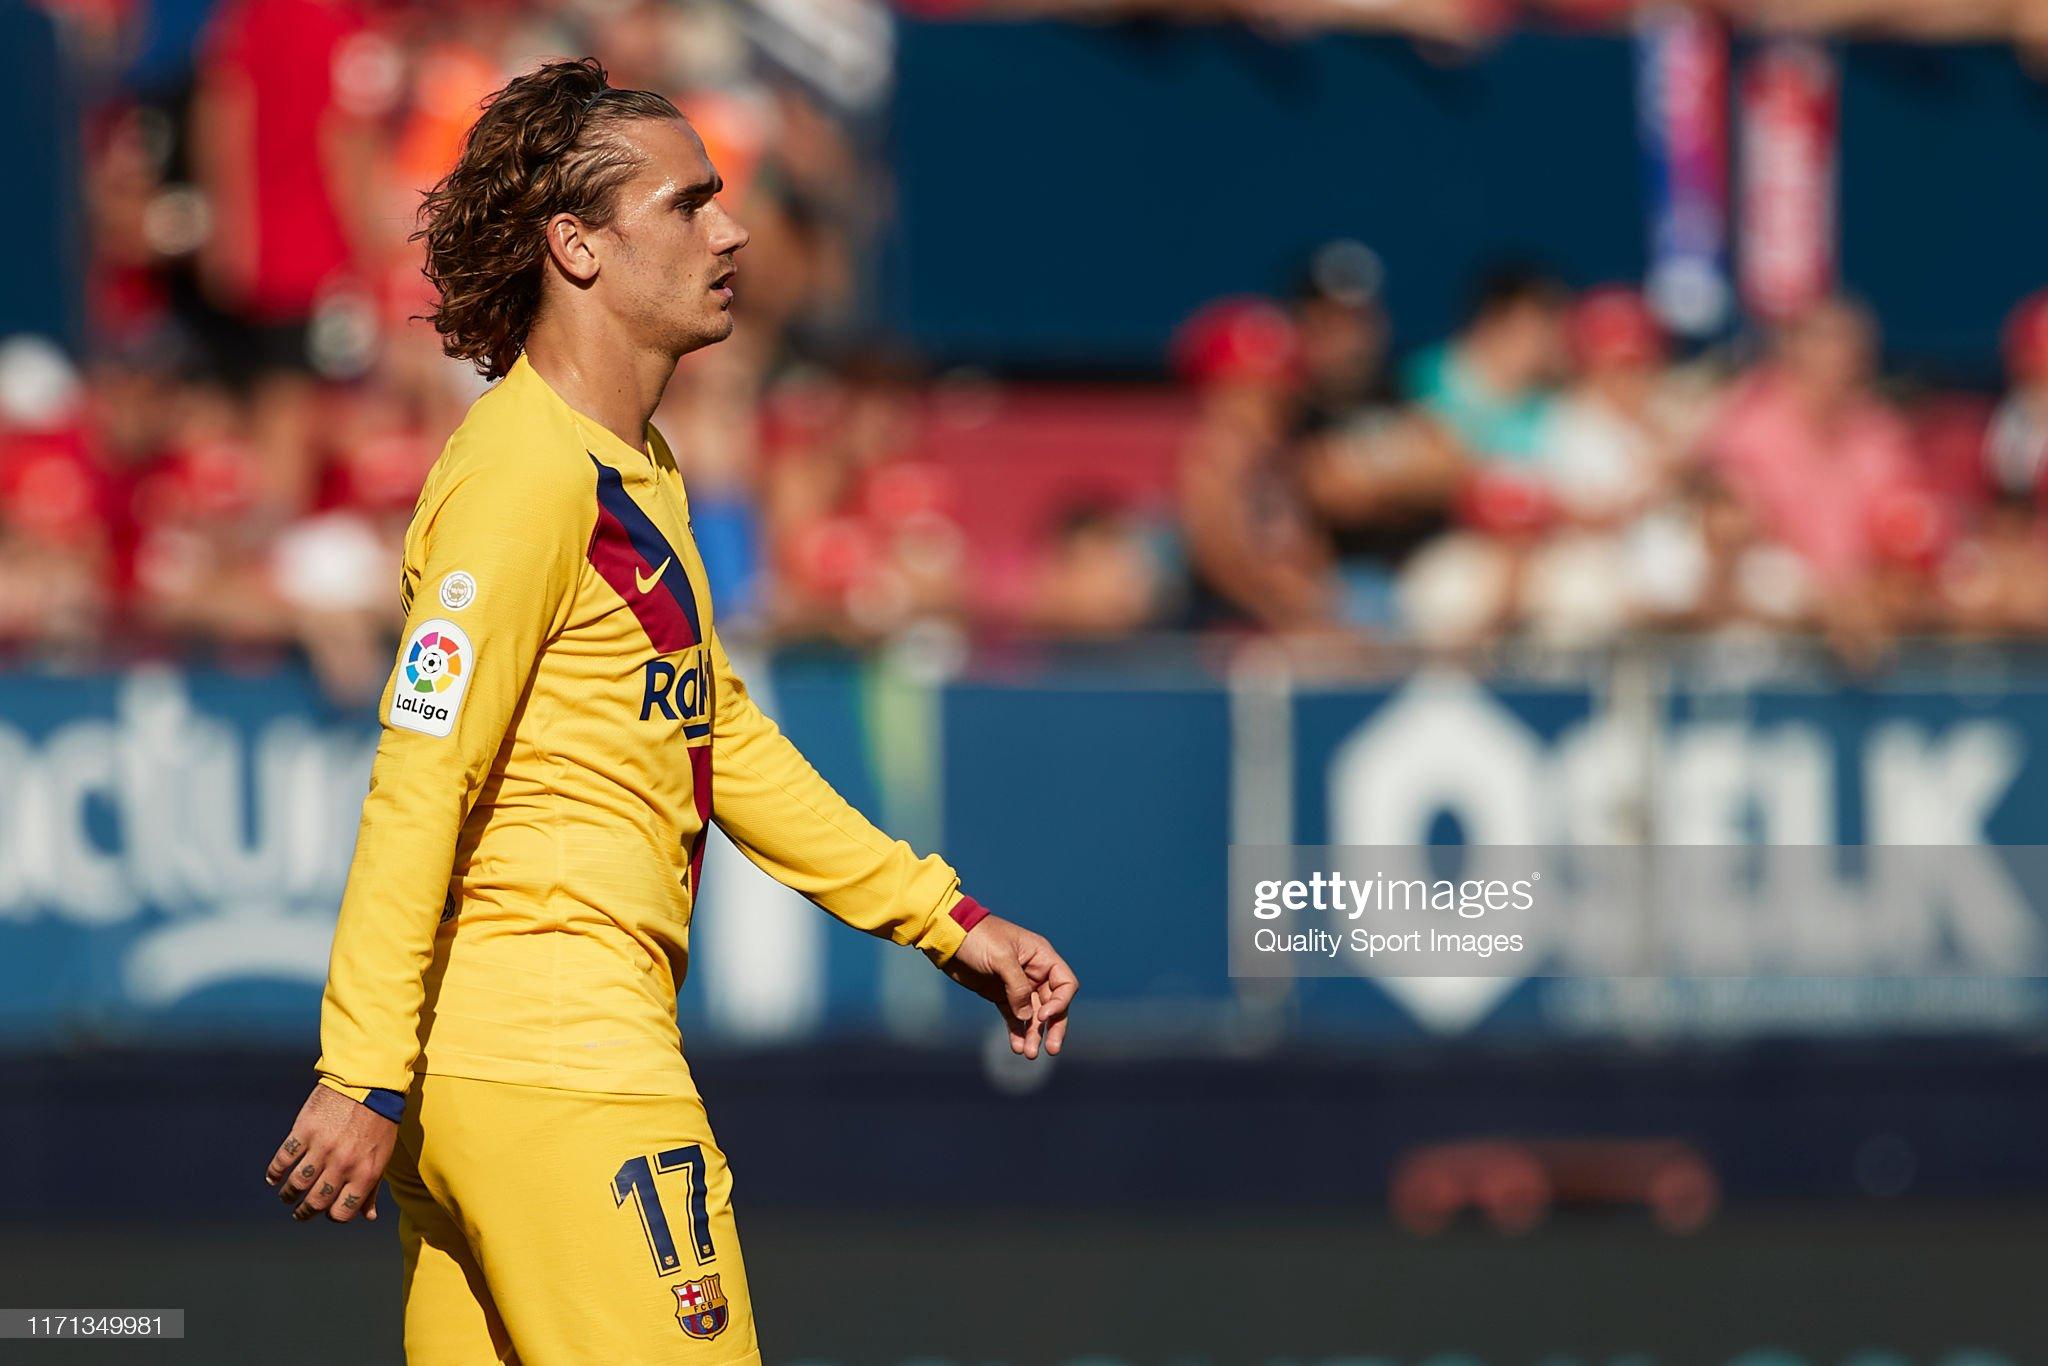 صور مباراة : أوساسونا - برشلونة 2-2 ( 31-08-2019 )  Antoine-griezmann-of-fc-barcelona-looks-on-during-the-liga-match-ca-picture-id1171349981?s=2048x2048